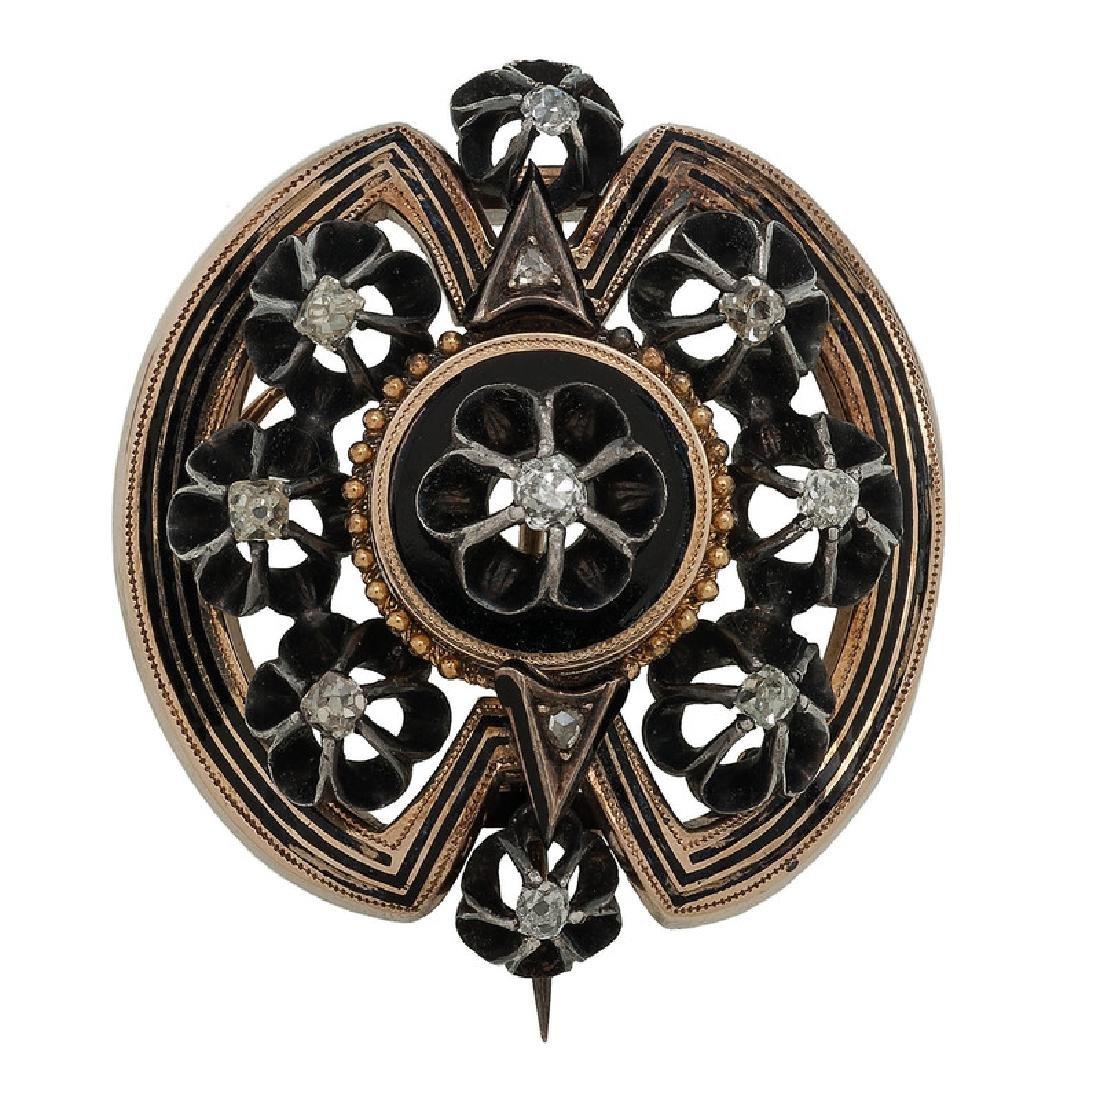 14 Karat Yellow Gold and Silver Victorian Diamond